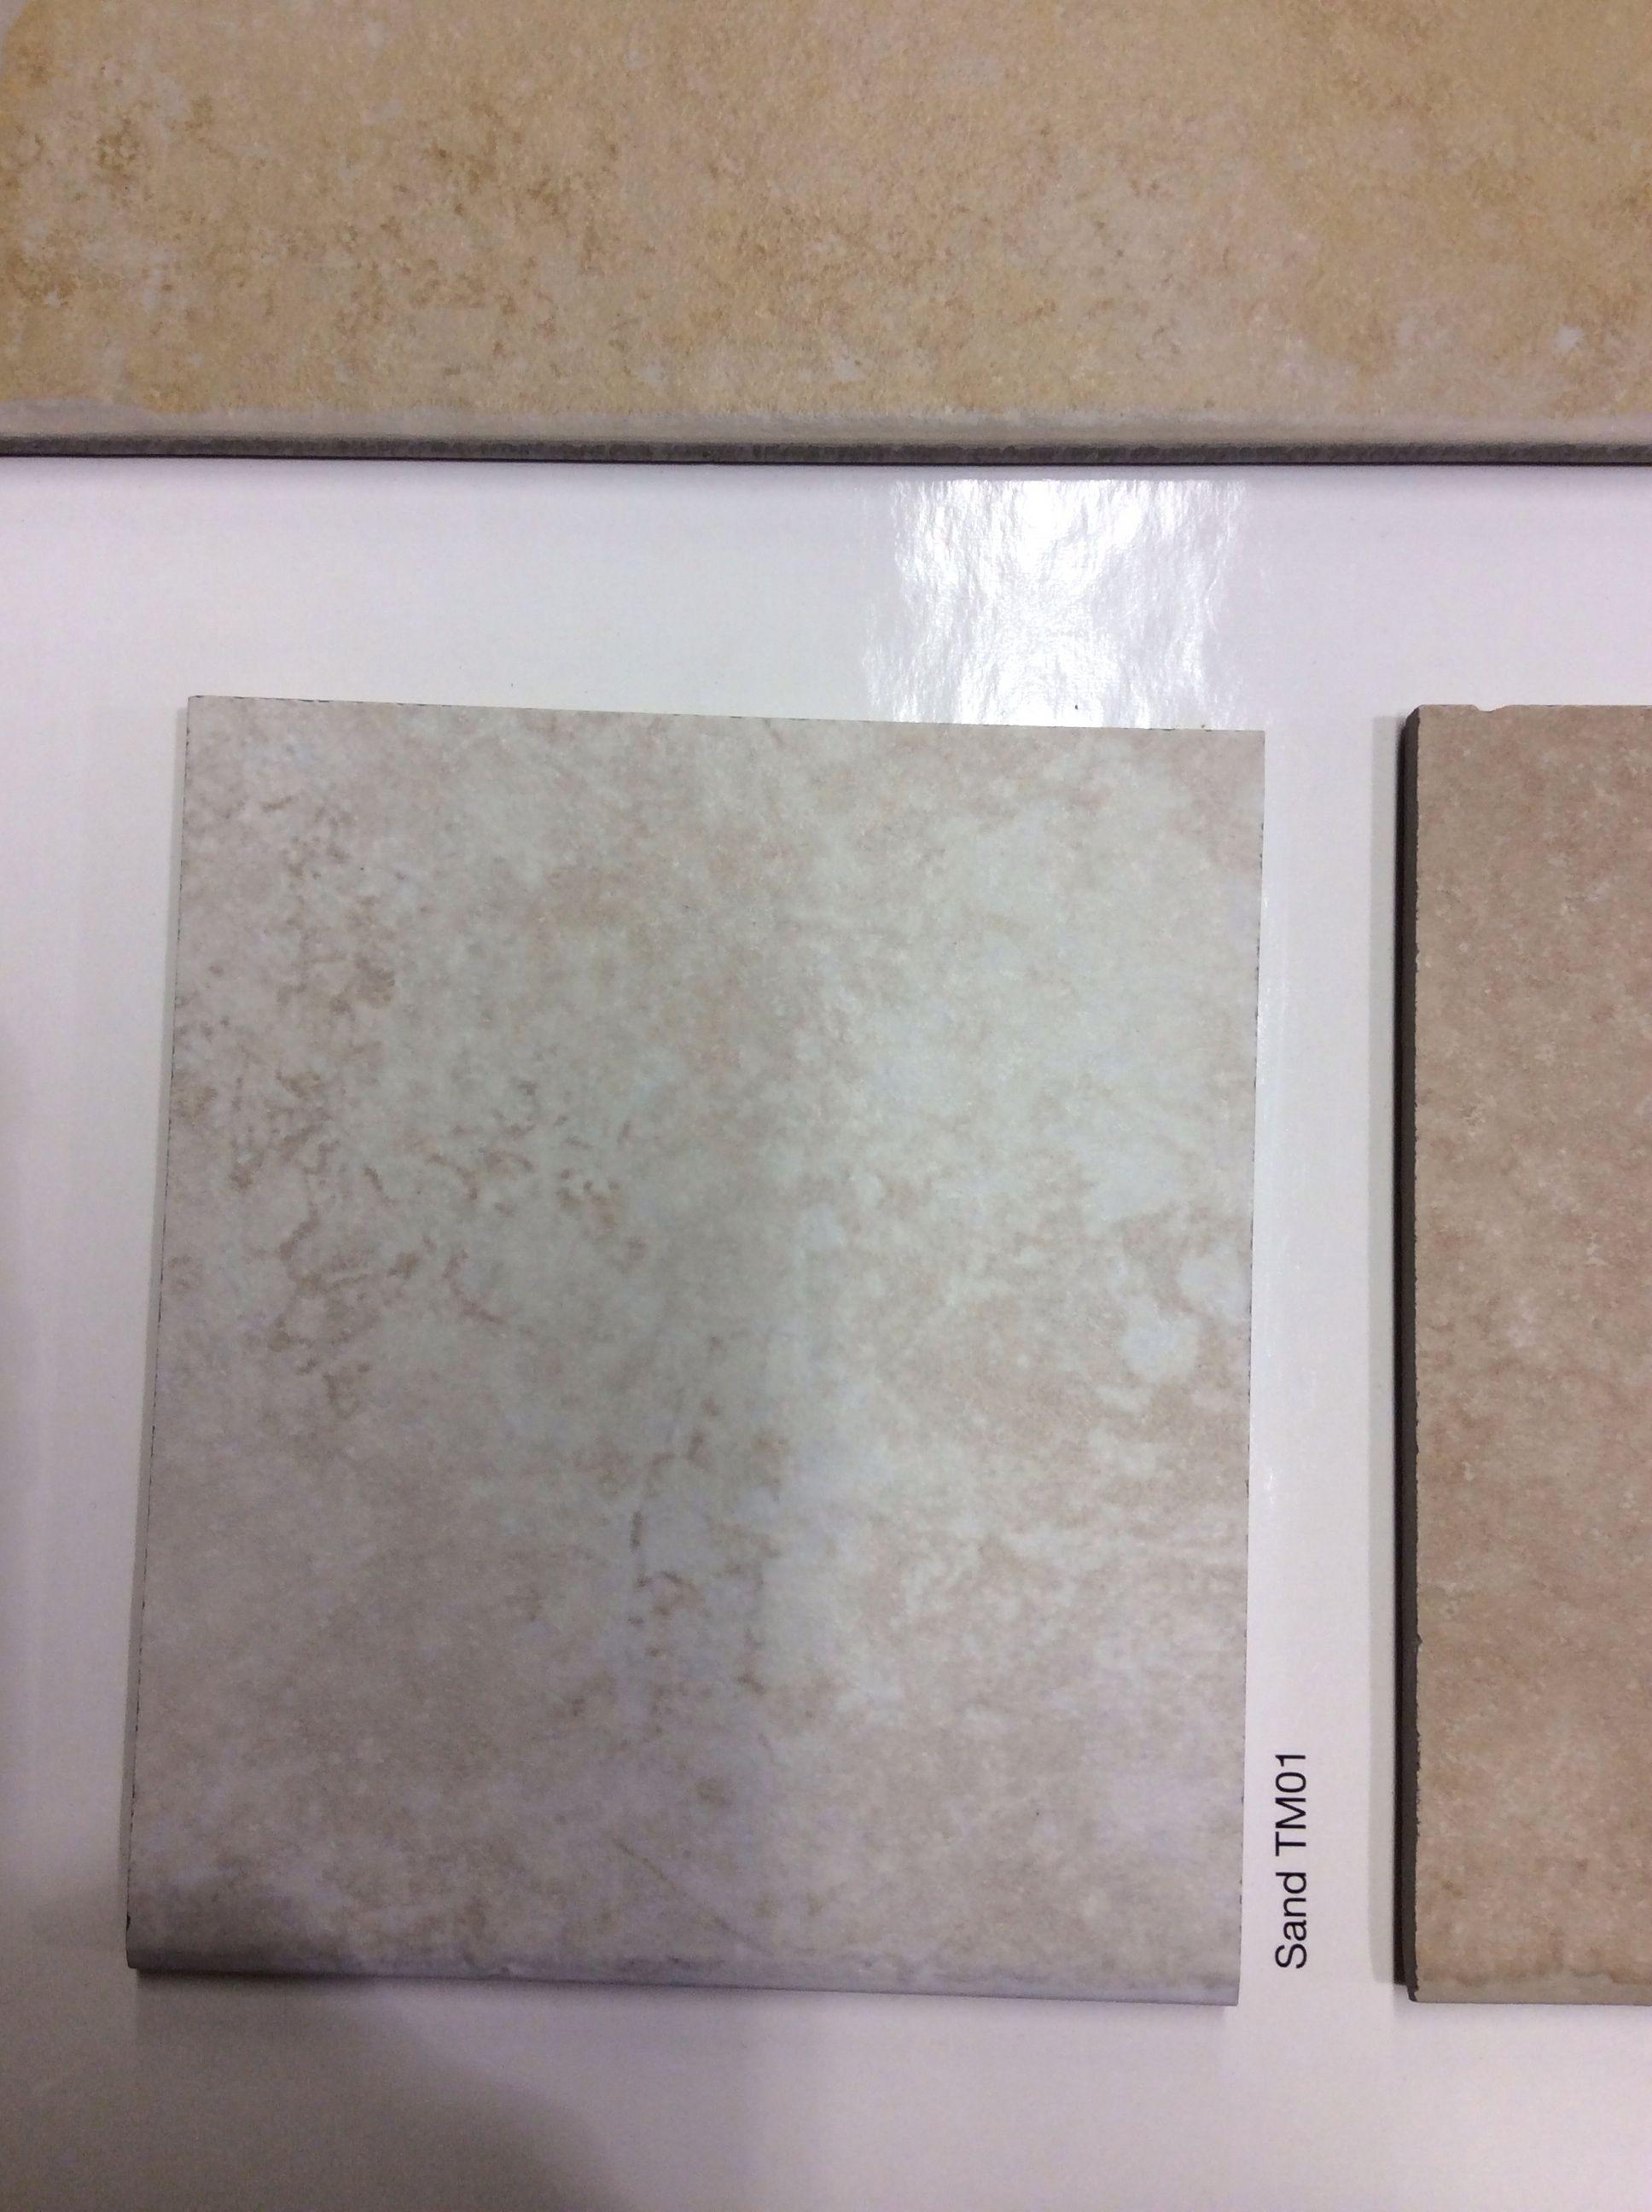 J&J bath tile (With images) Bath tiles, Maple grove mn